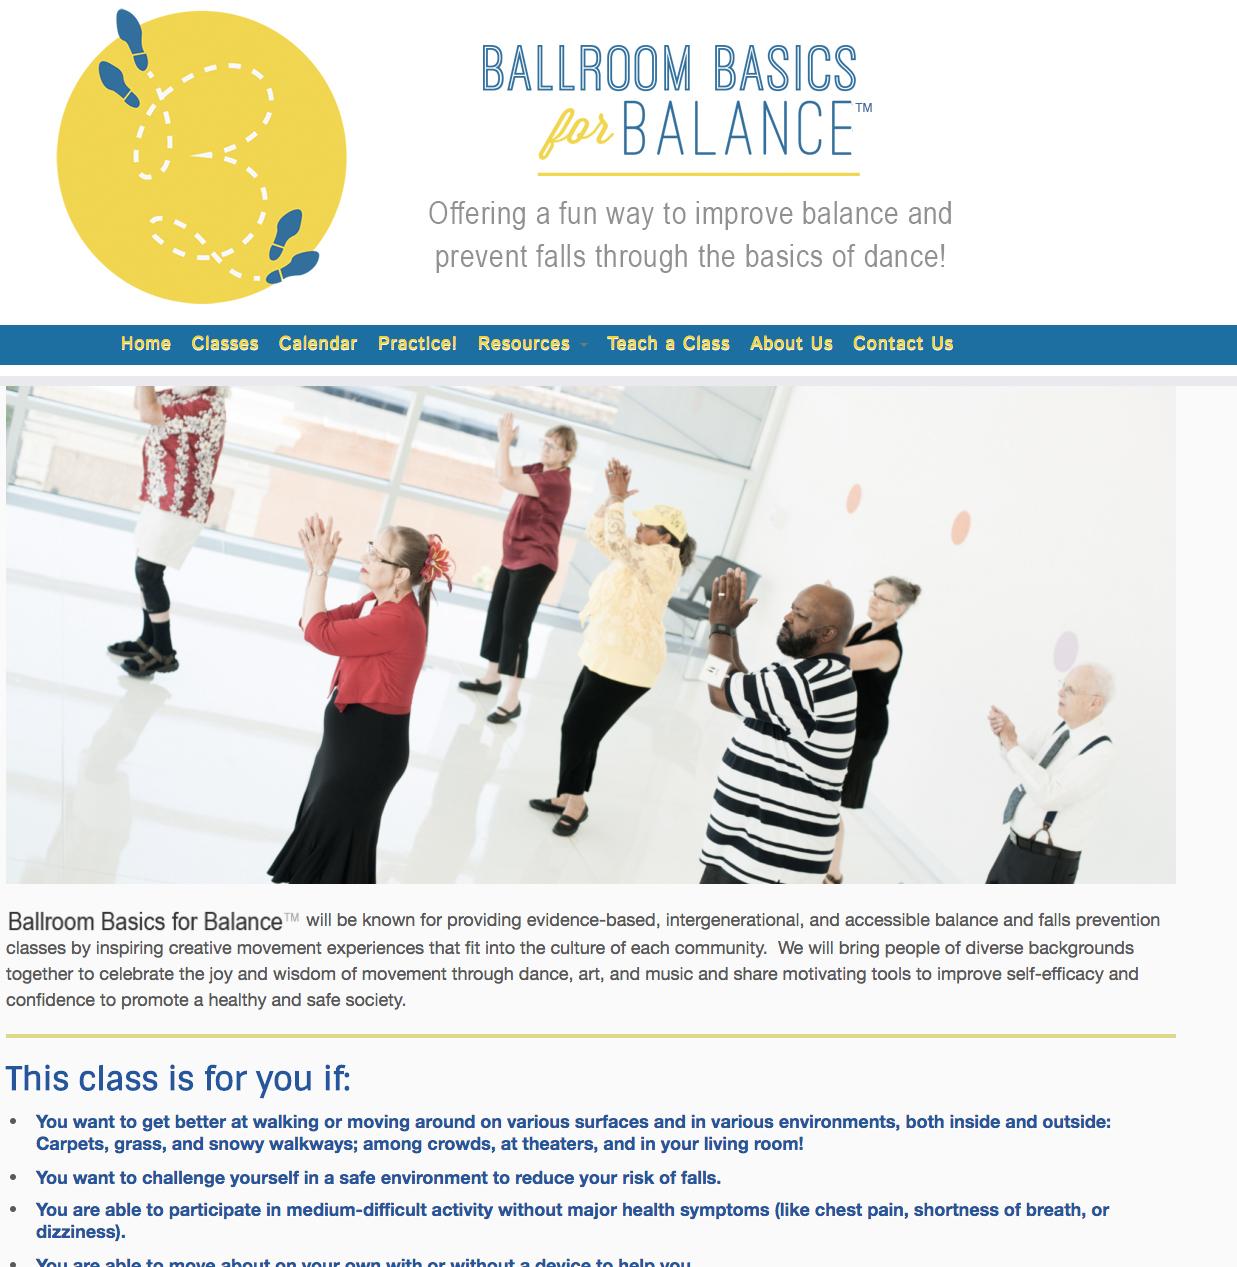 BallroomBasicsForBalance.org